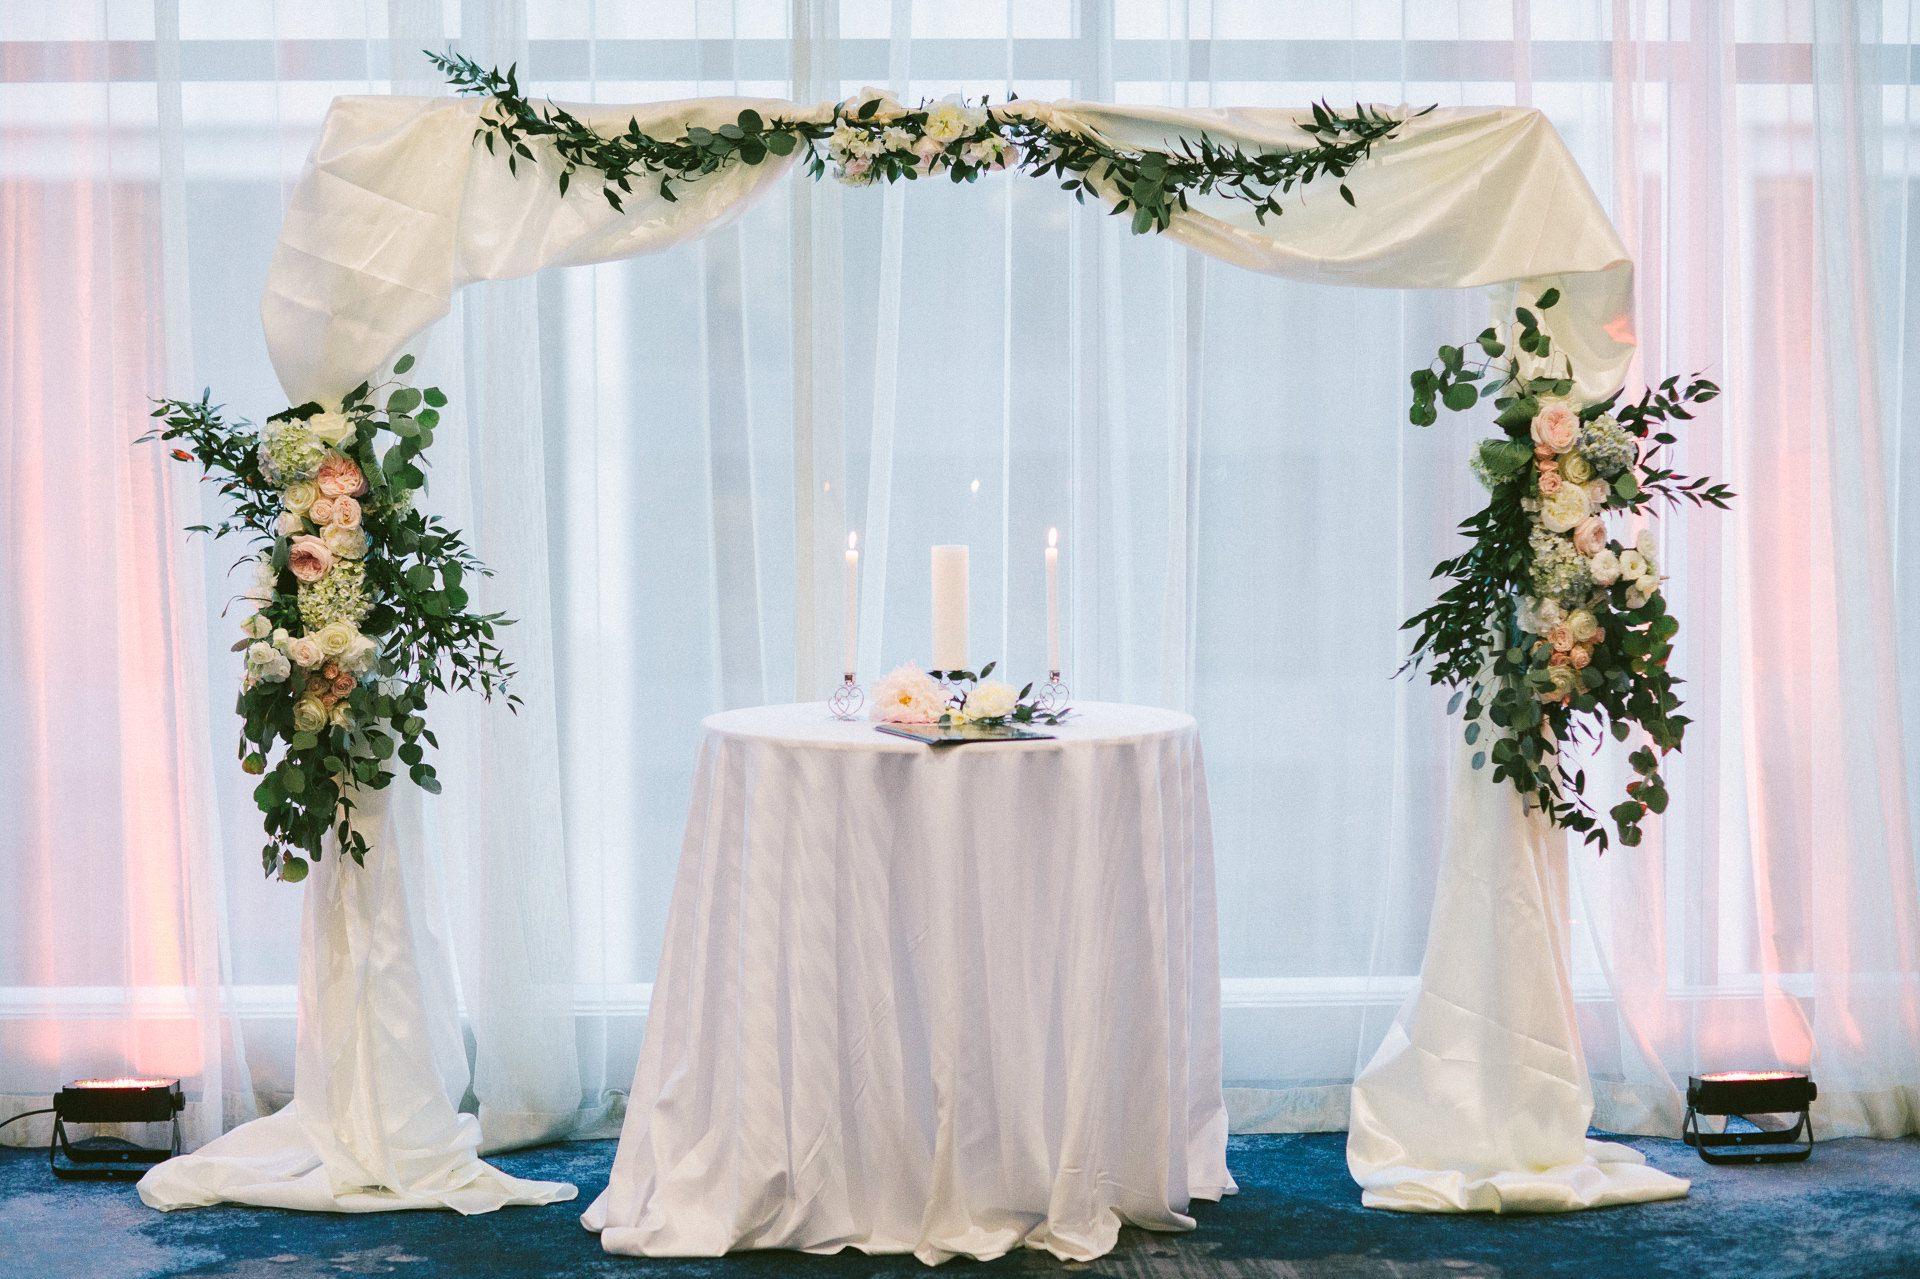 Dowtown Hilton Cleveland Wedding Photographer 2 5.jpg